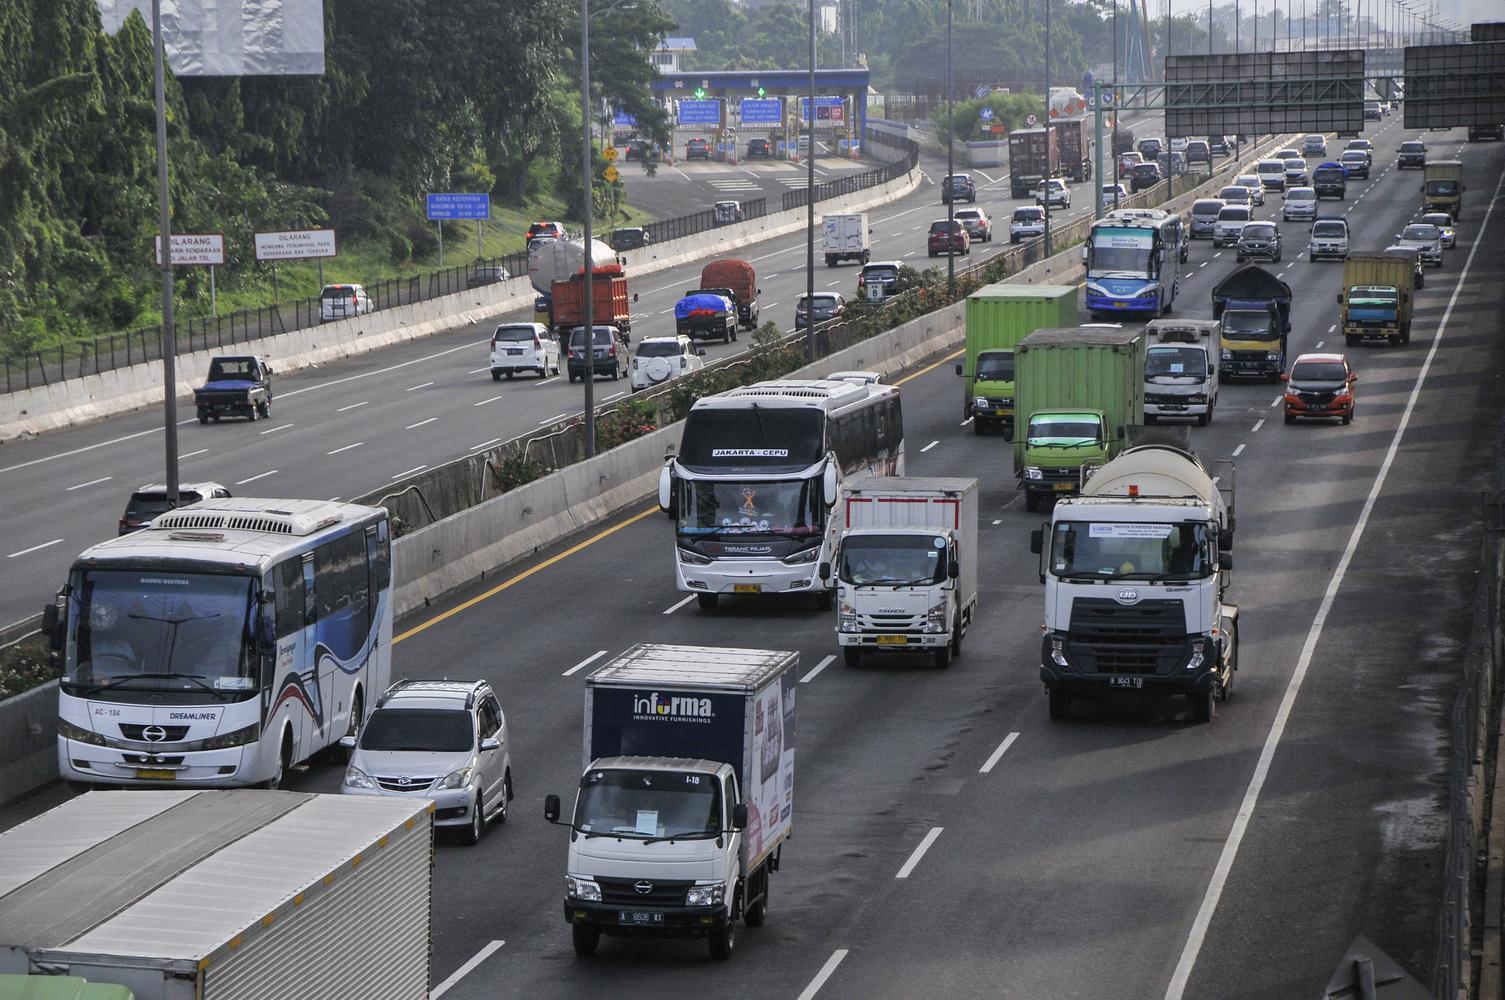 KENAIKAN VOLUME KENDARAAN DI TOL JAKARTA-CIKAMPEK